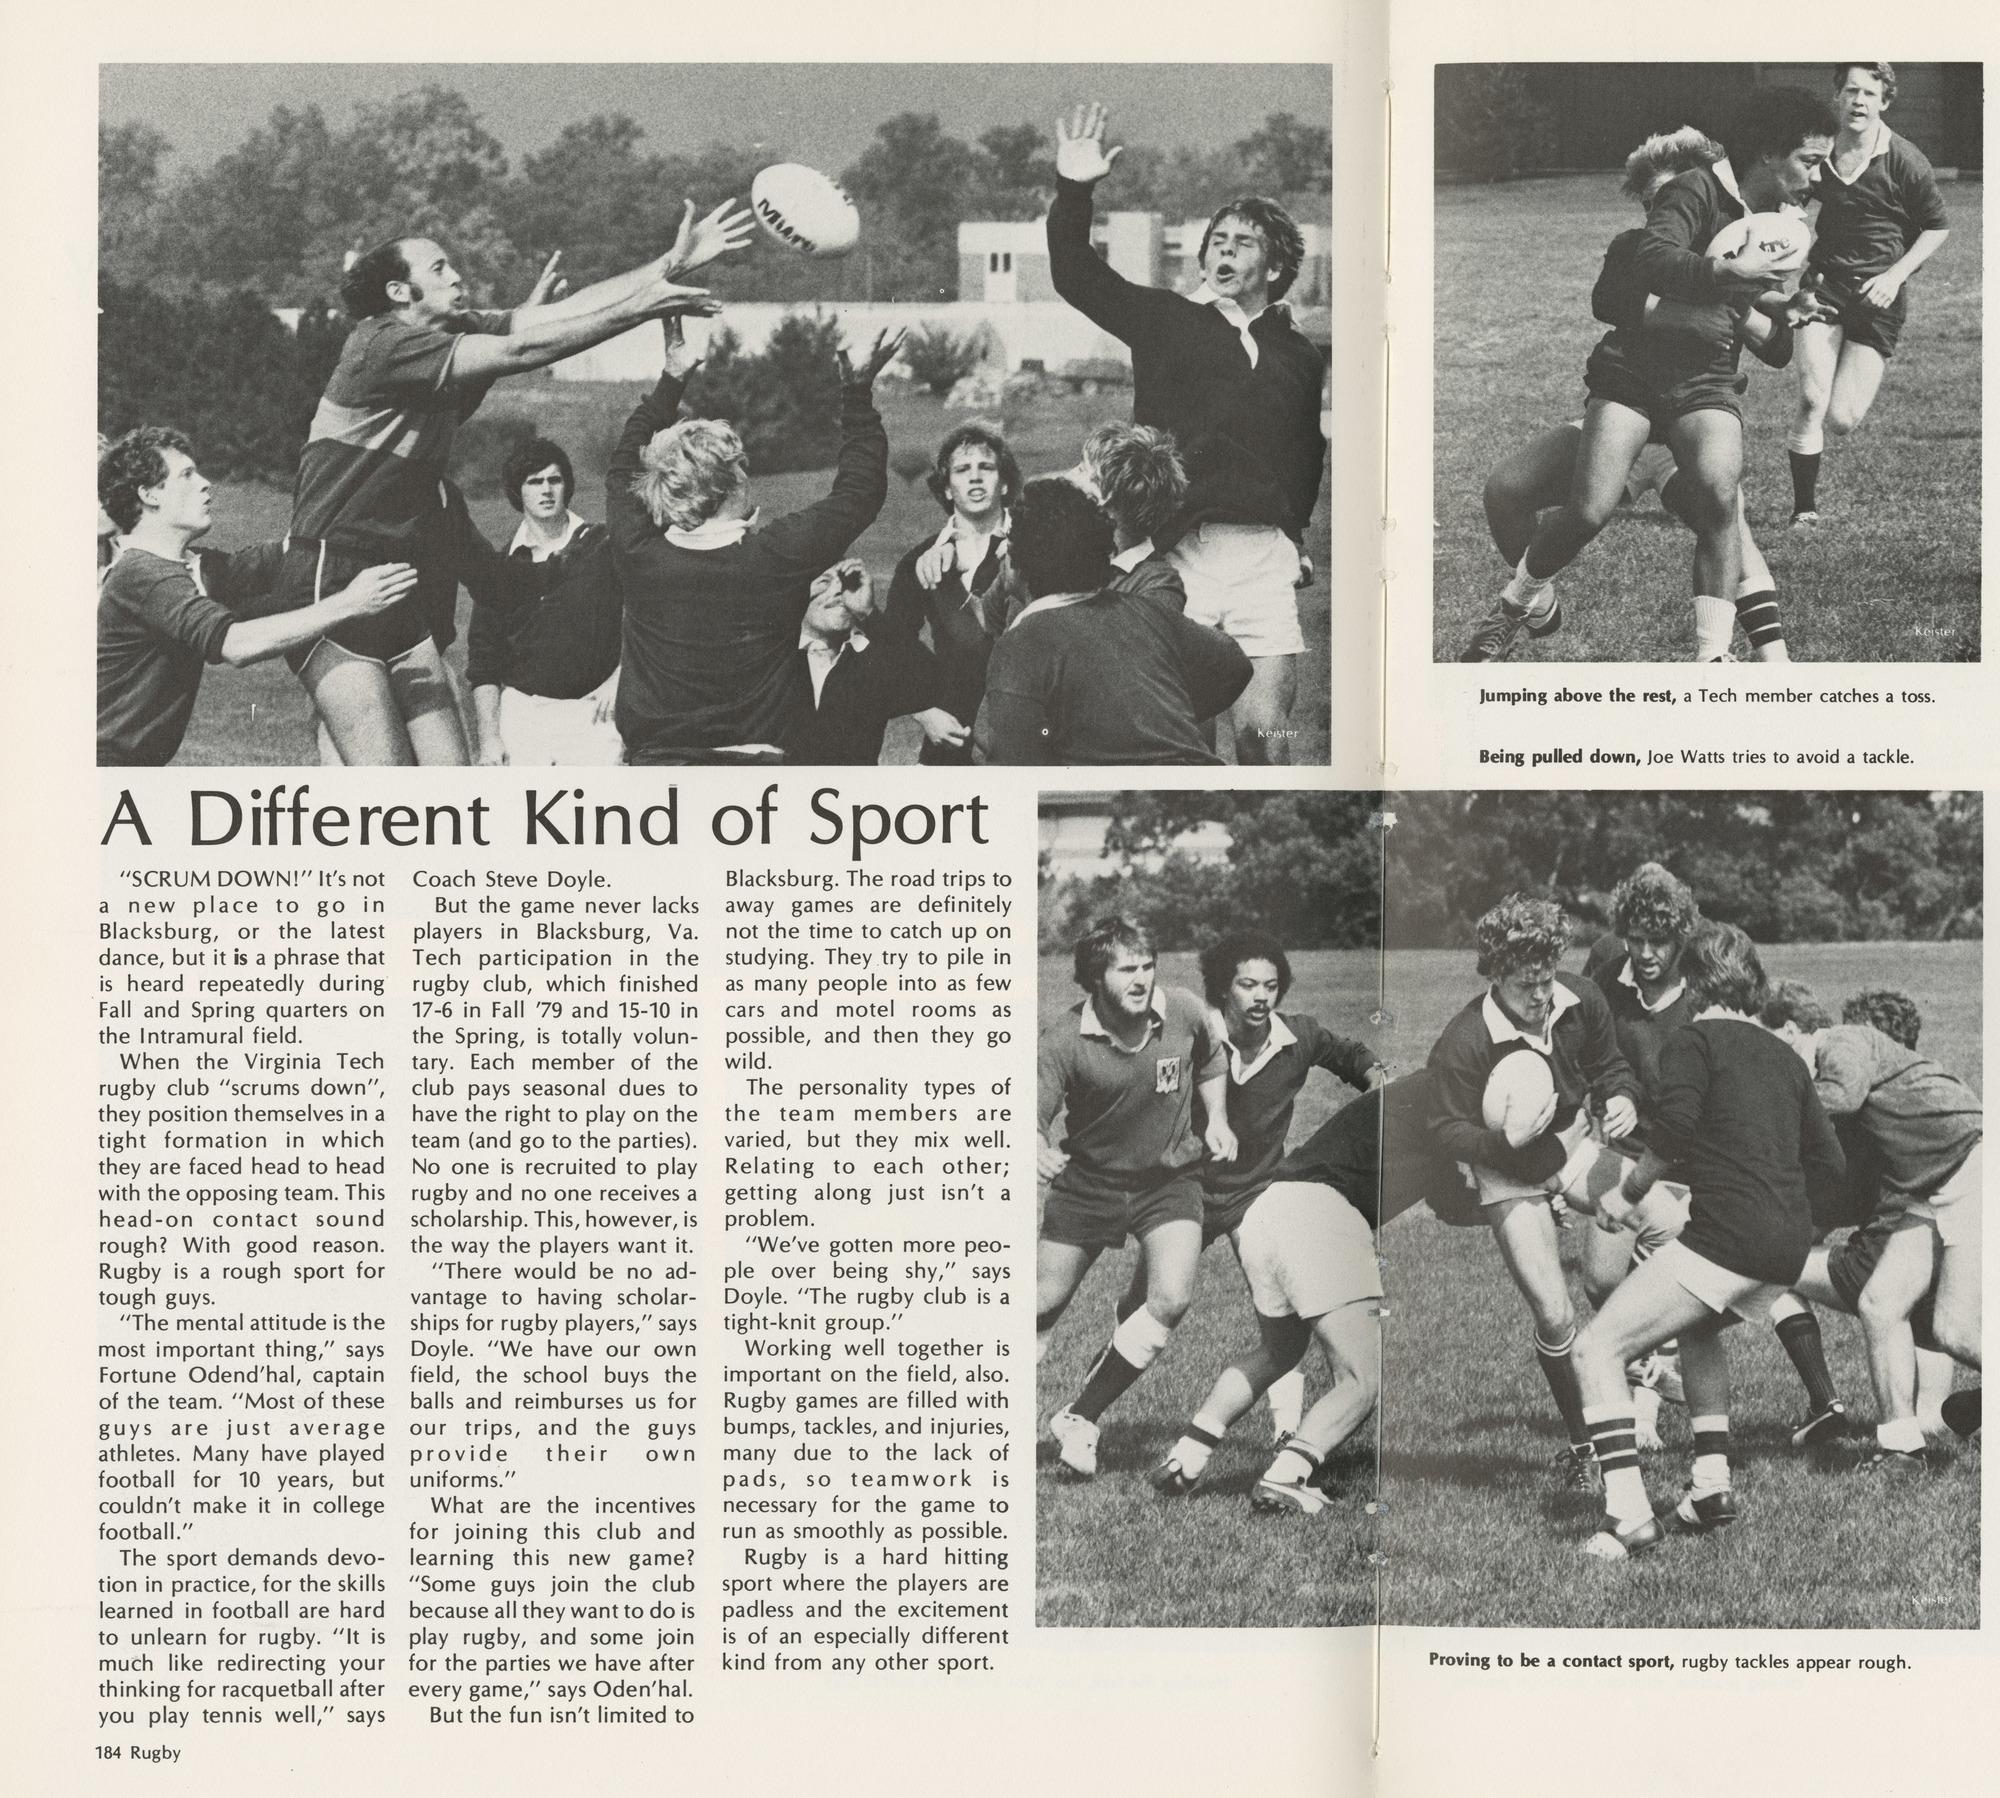 http://spec.lib.vt.edu/pickup/Omeka_upload/Bugle1981_pg184_Rugby.jpg